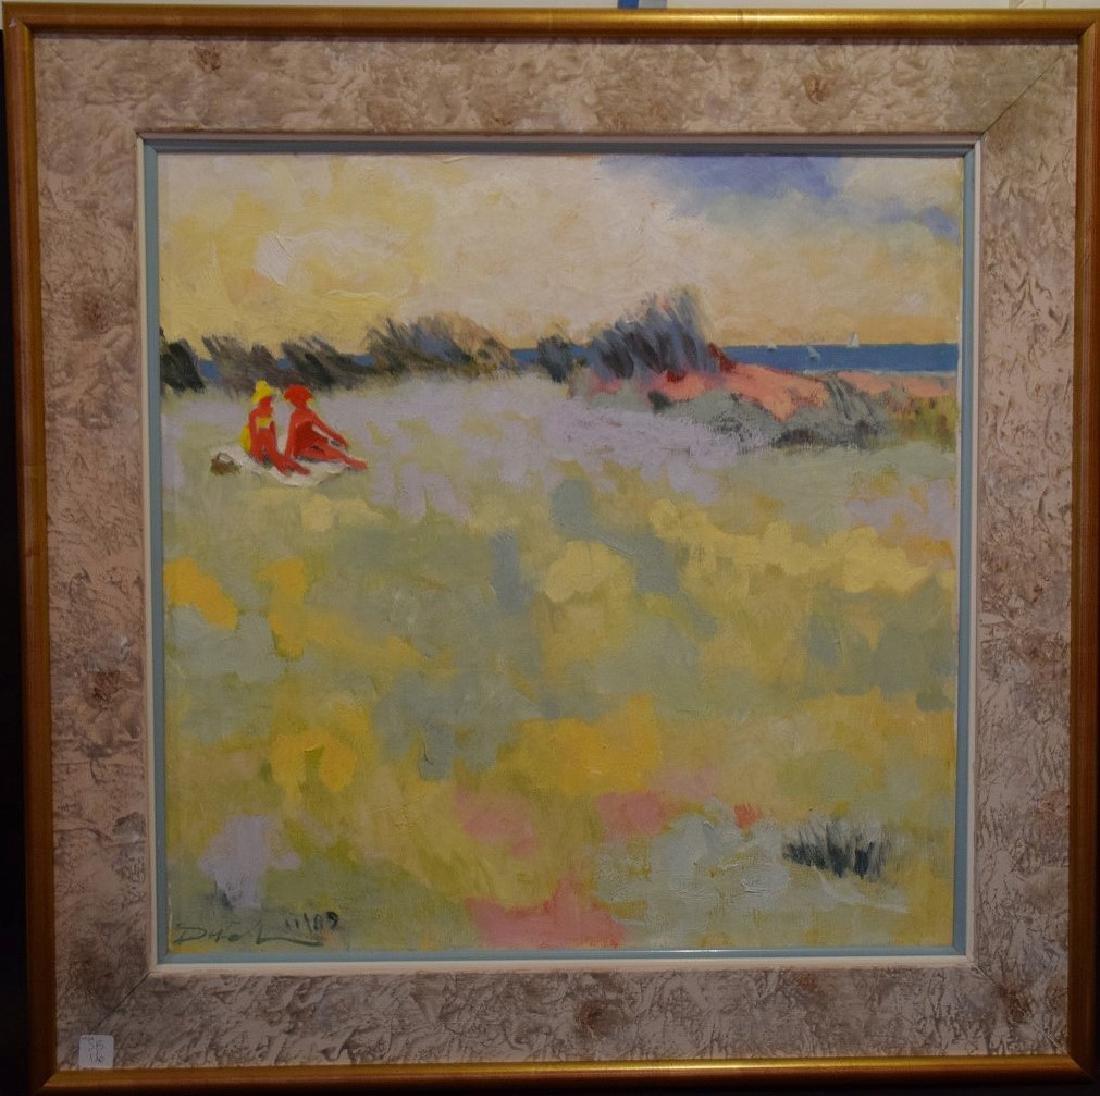 Am School oil on canvas, girls at the beach, 24 x 24